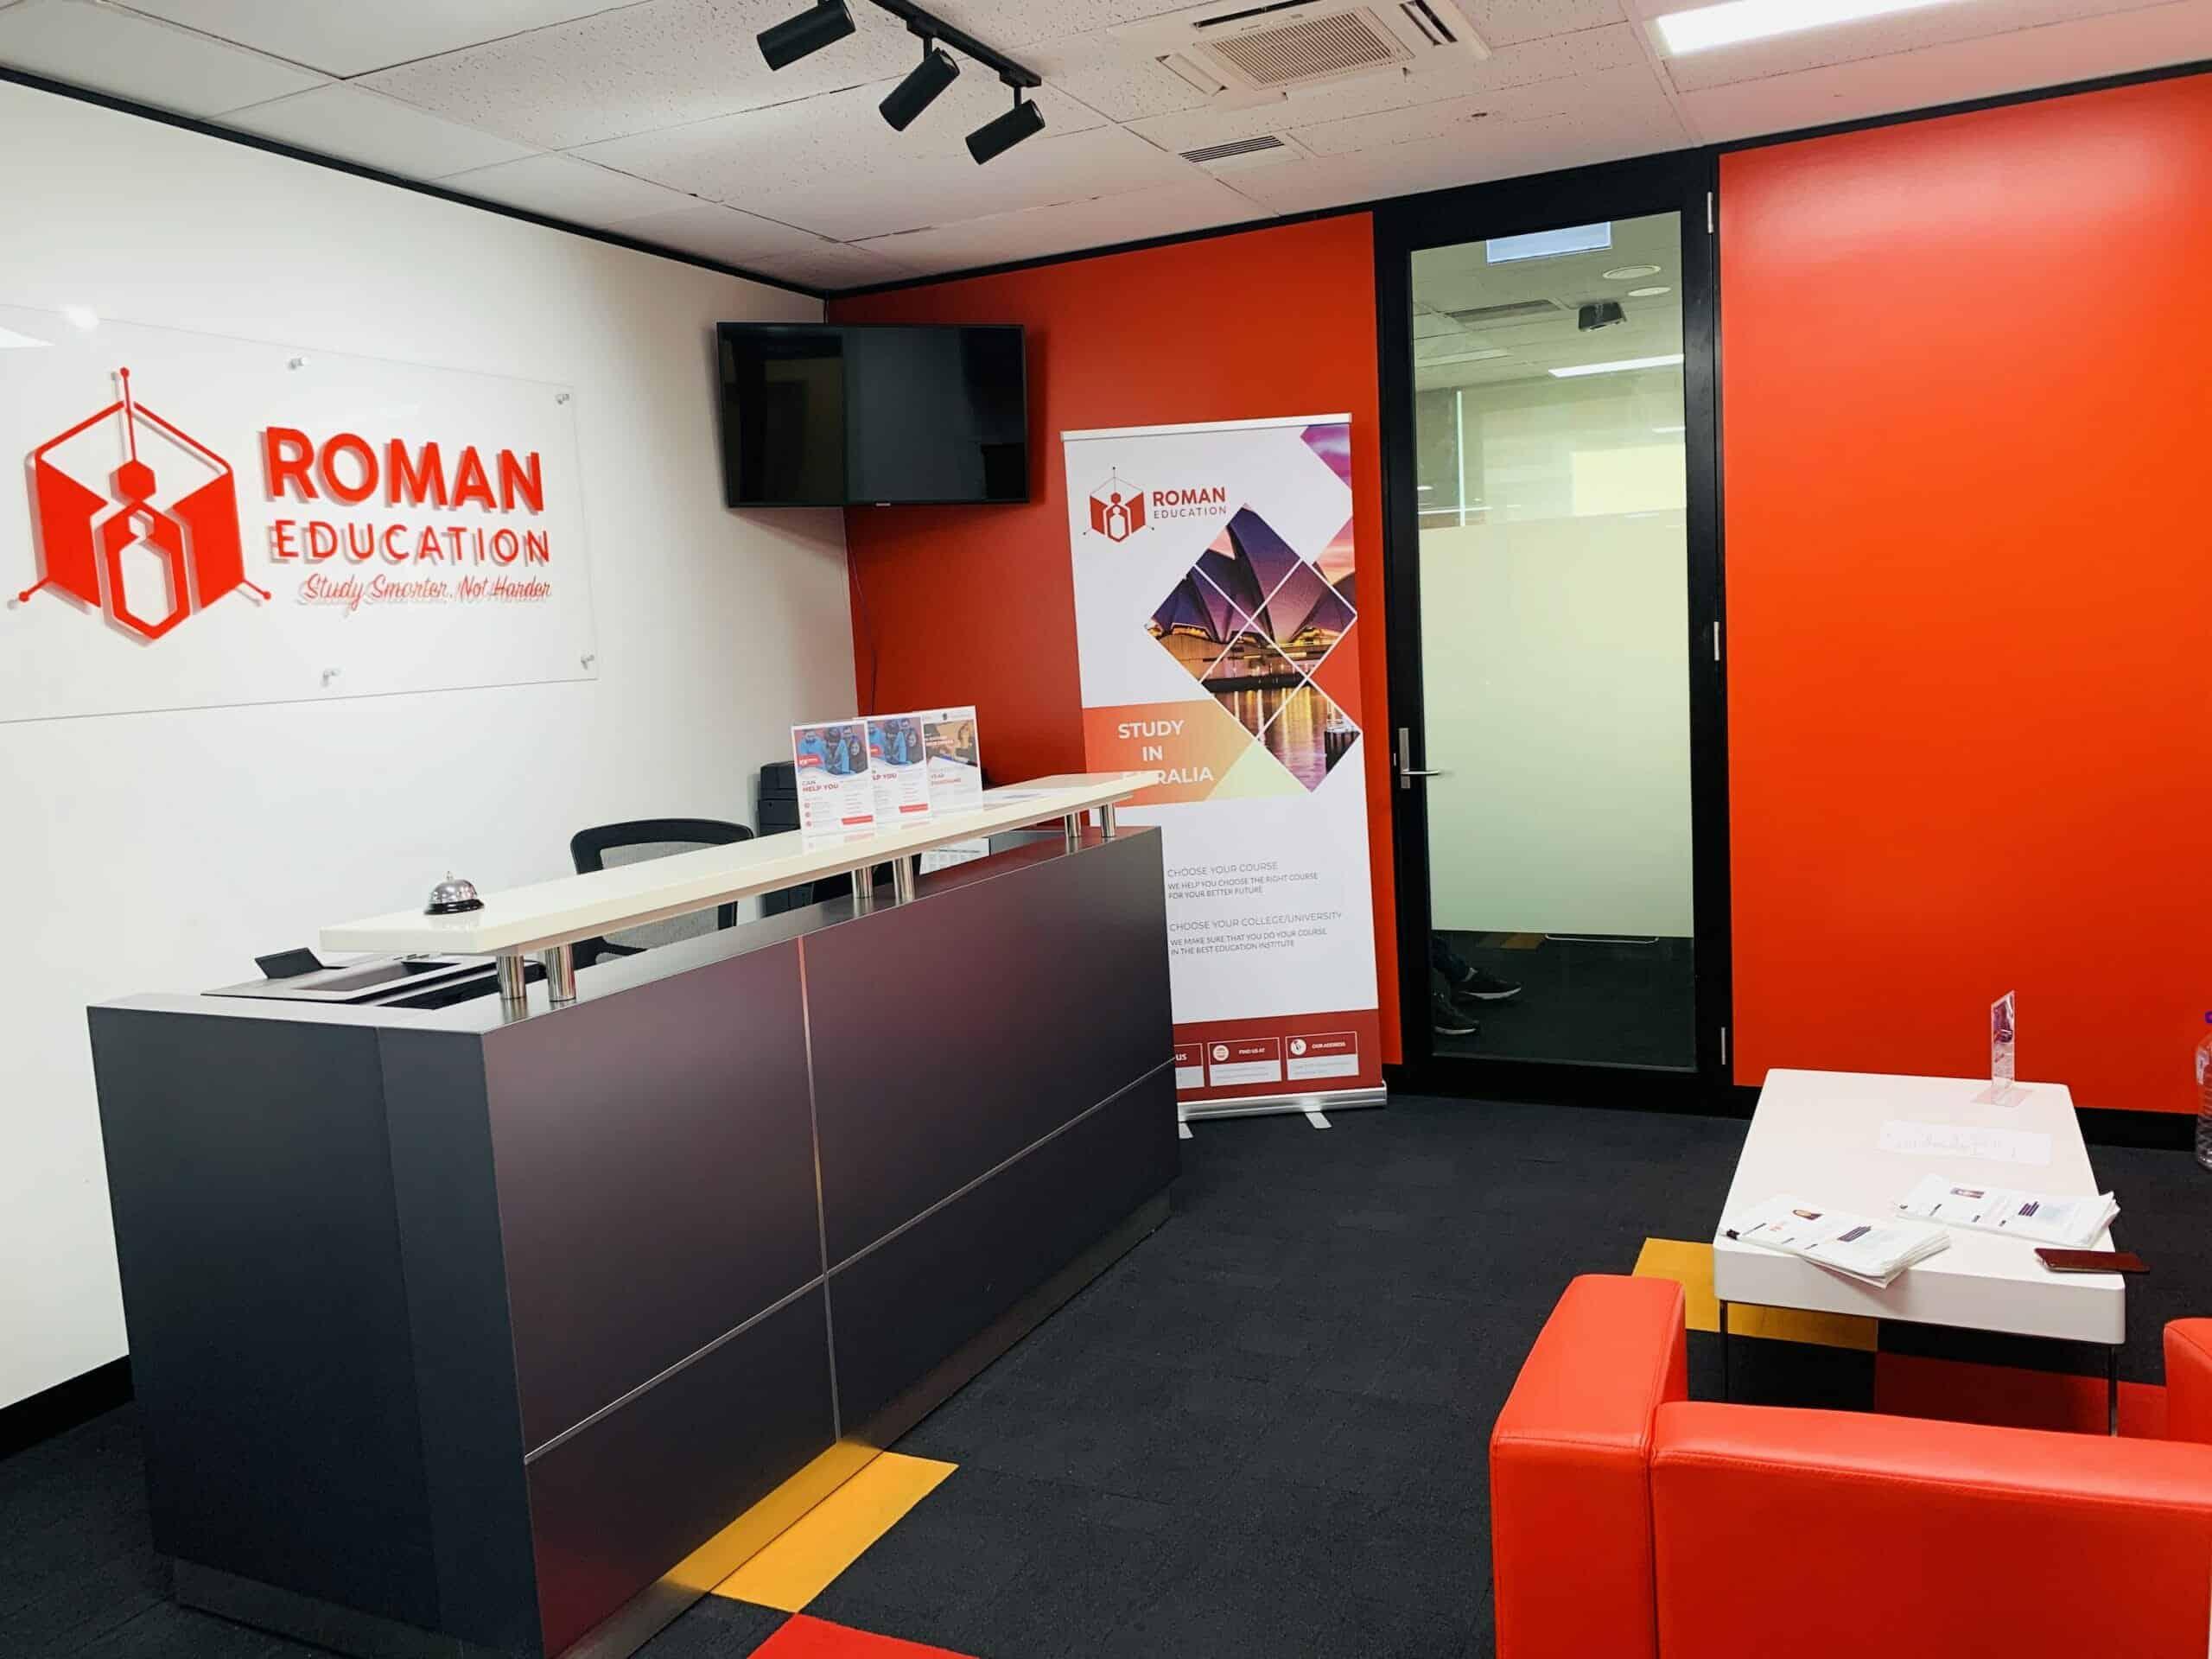 Roman Education Office